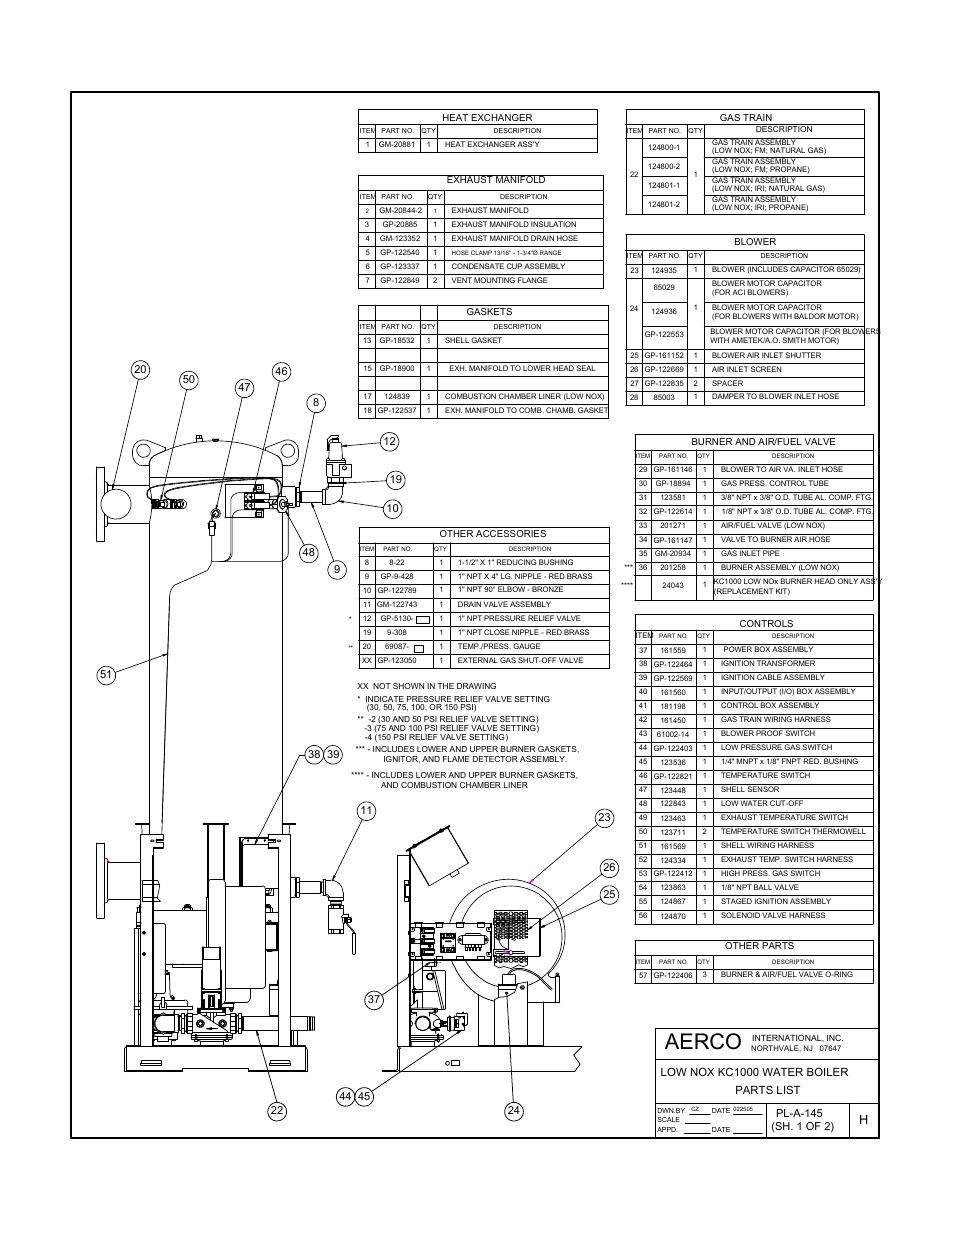 Appendix f, Aerco, Parts list low nox kc1000 water boiler | AERCO ...